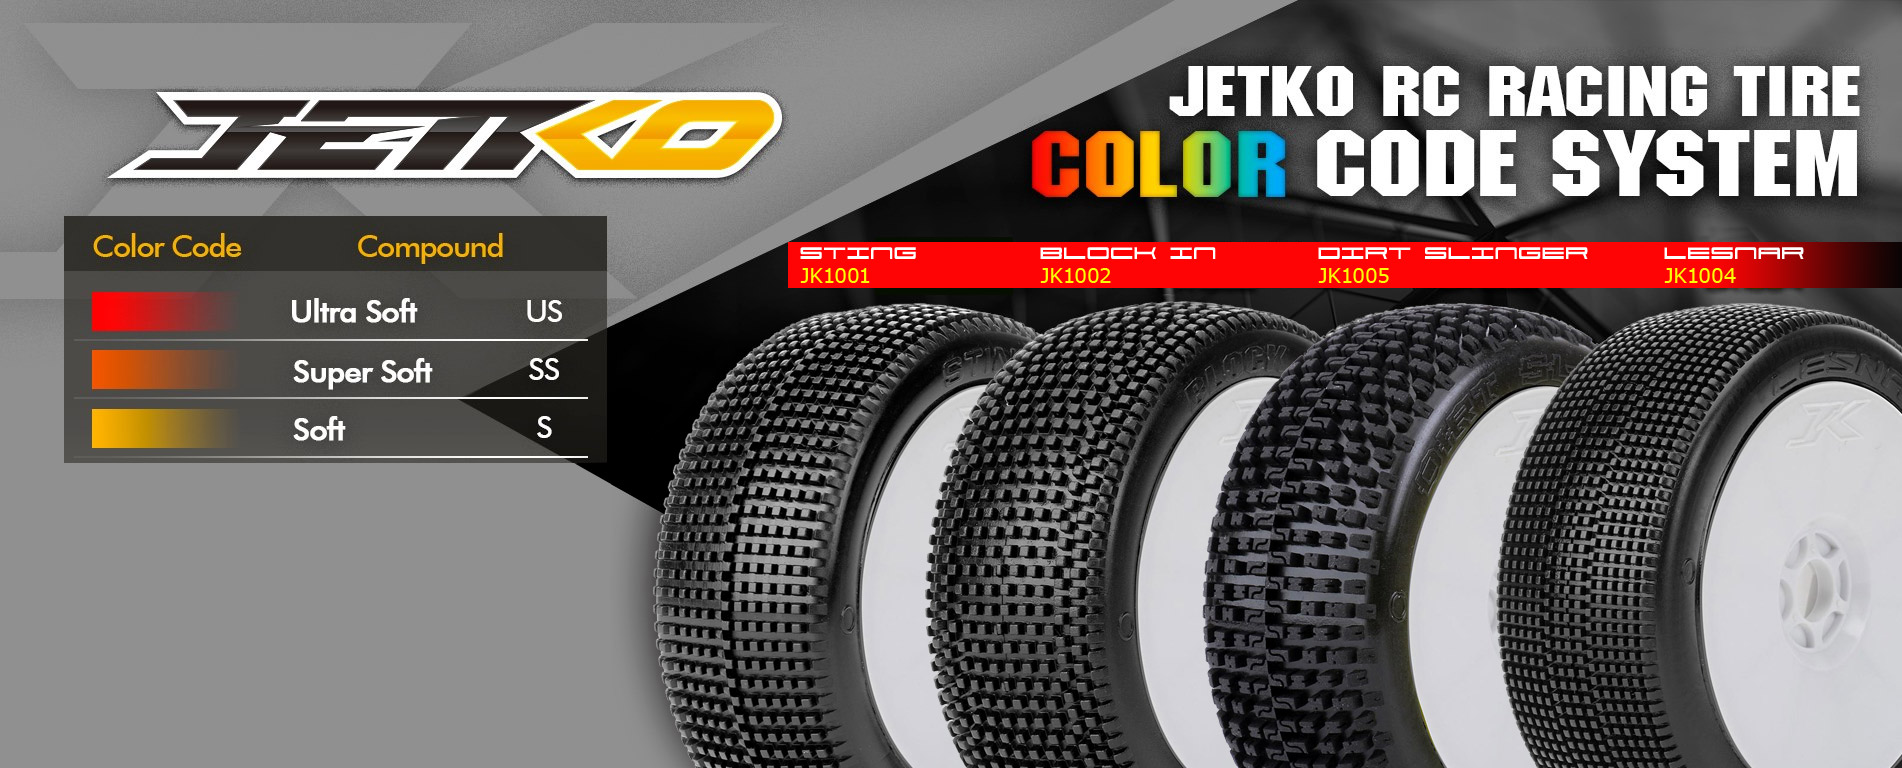 Gommes pneus Jetko